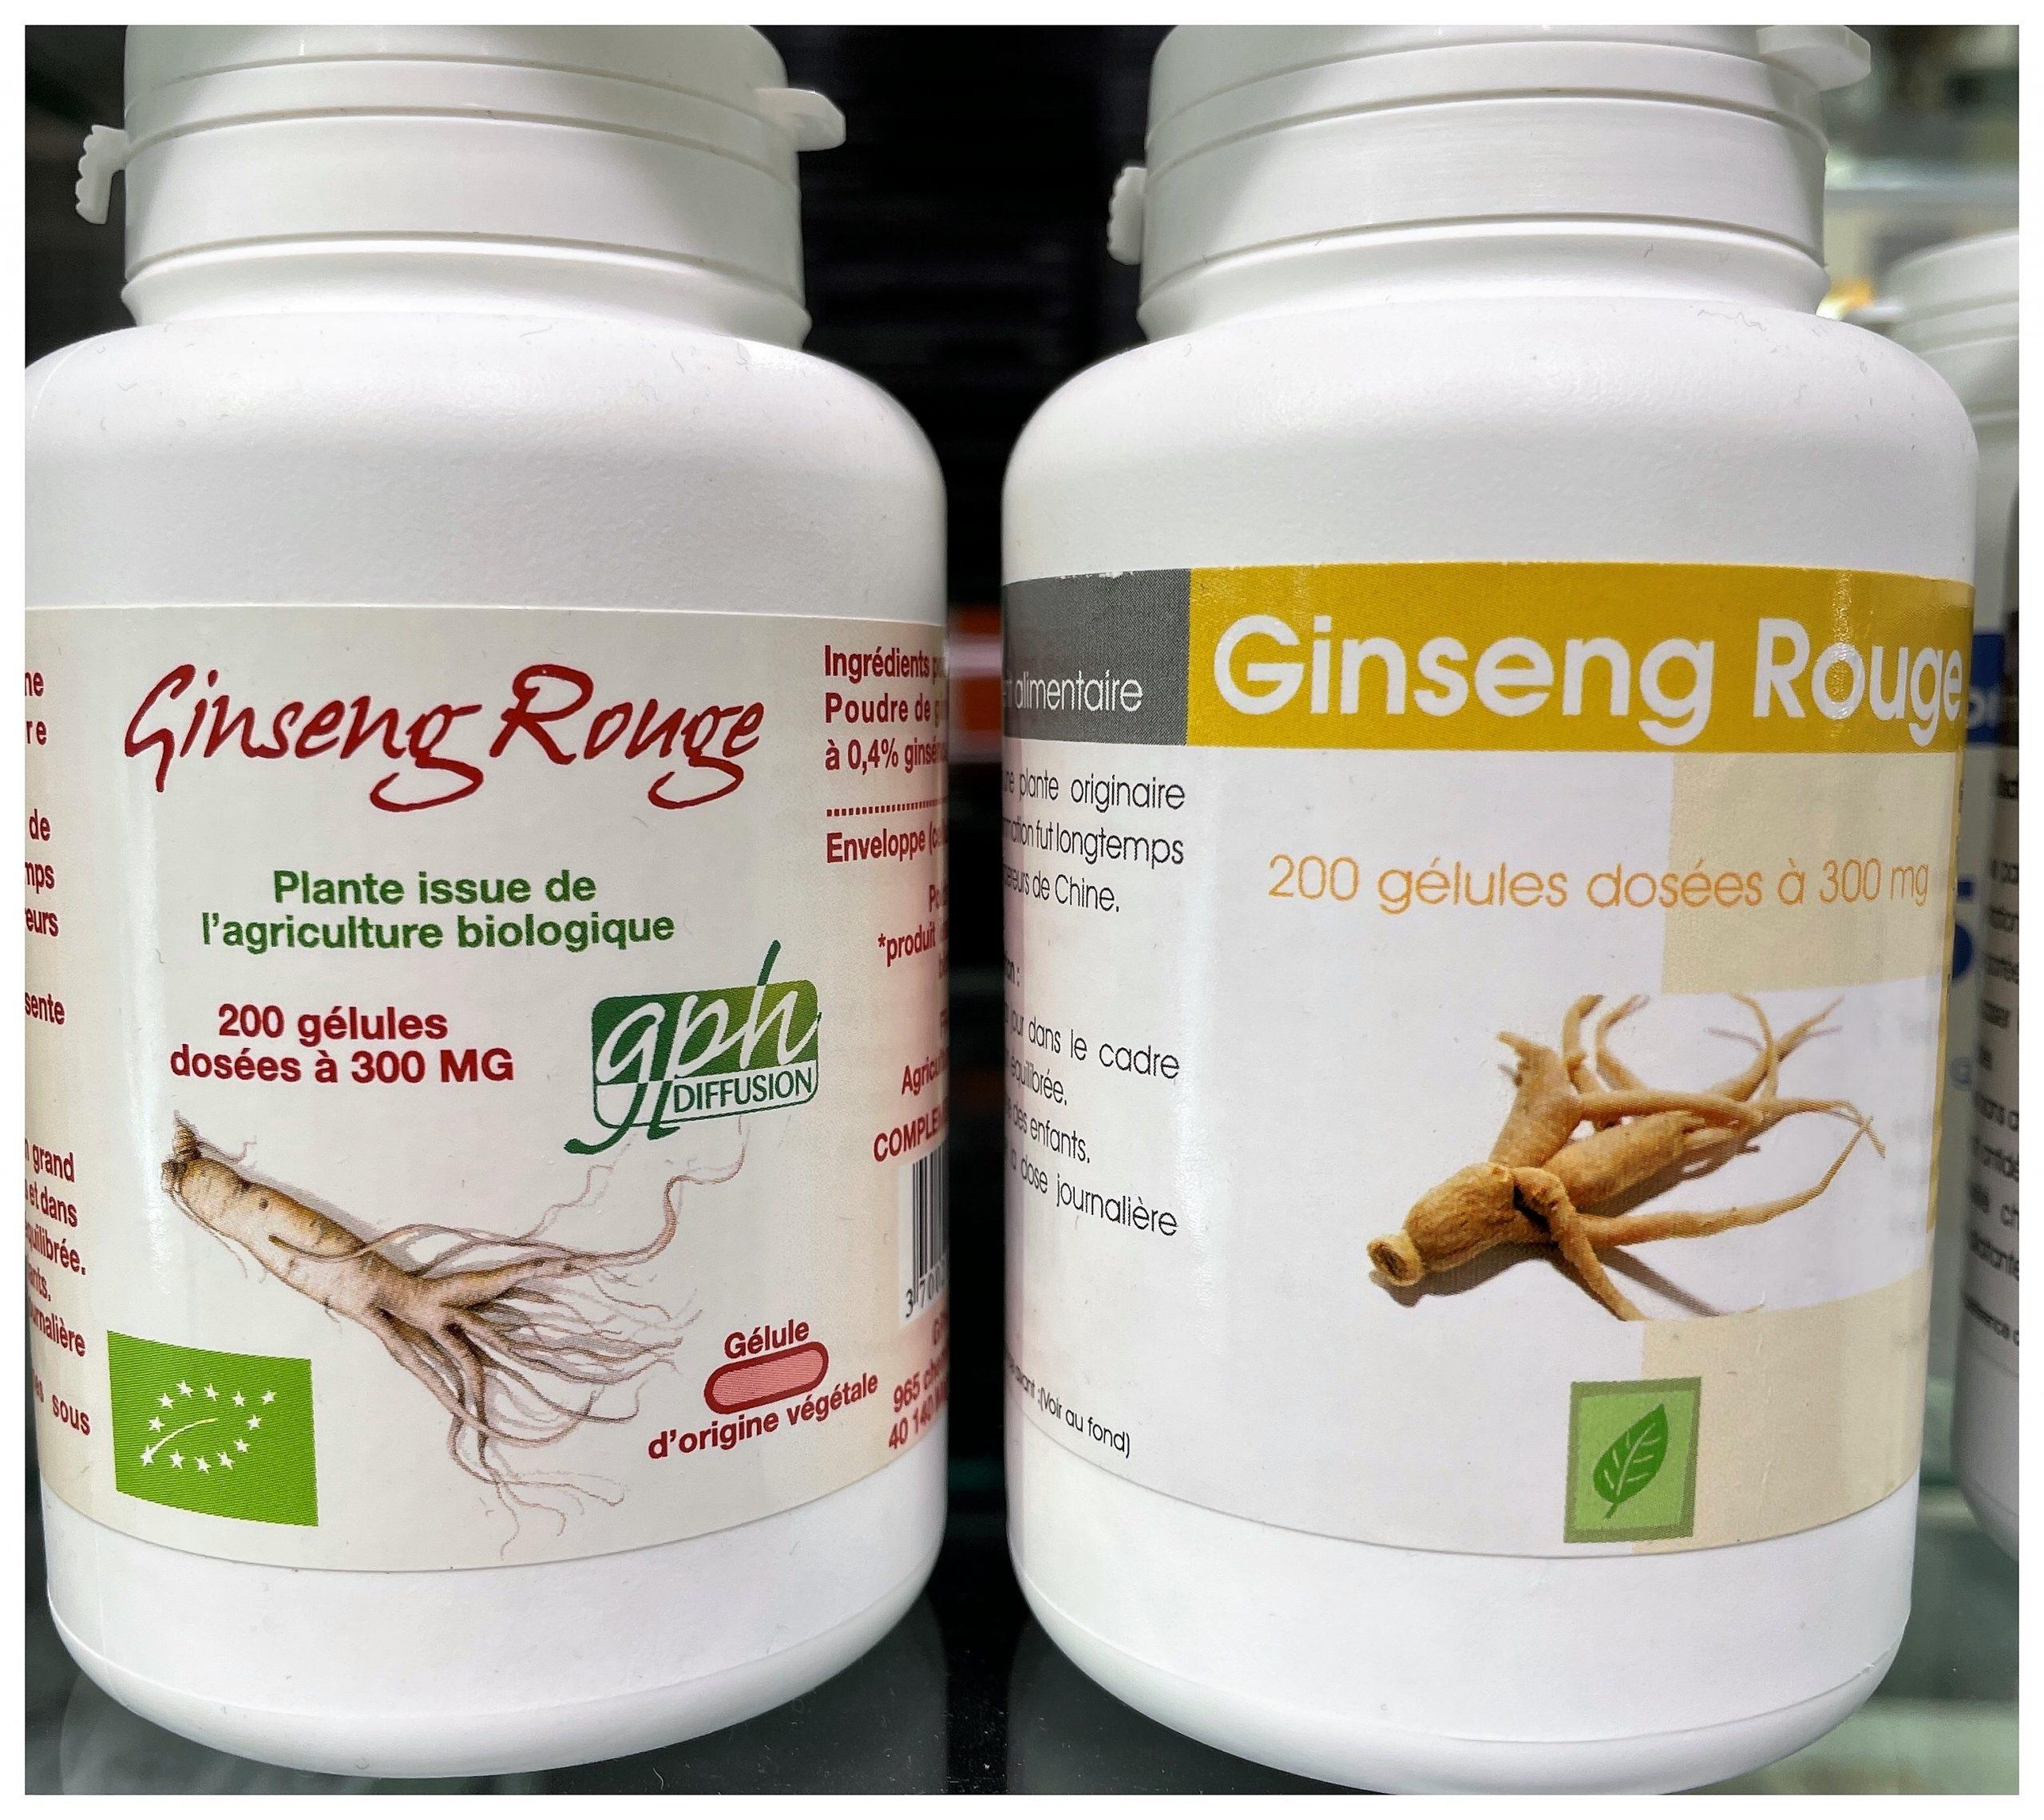 Ginseng Bio 400mg 200 comprimés GPH Diffusion contient 400mg de Panax ginseng bio par comprimé.